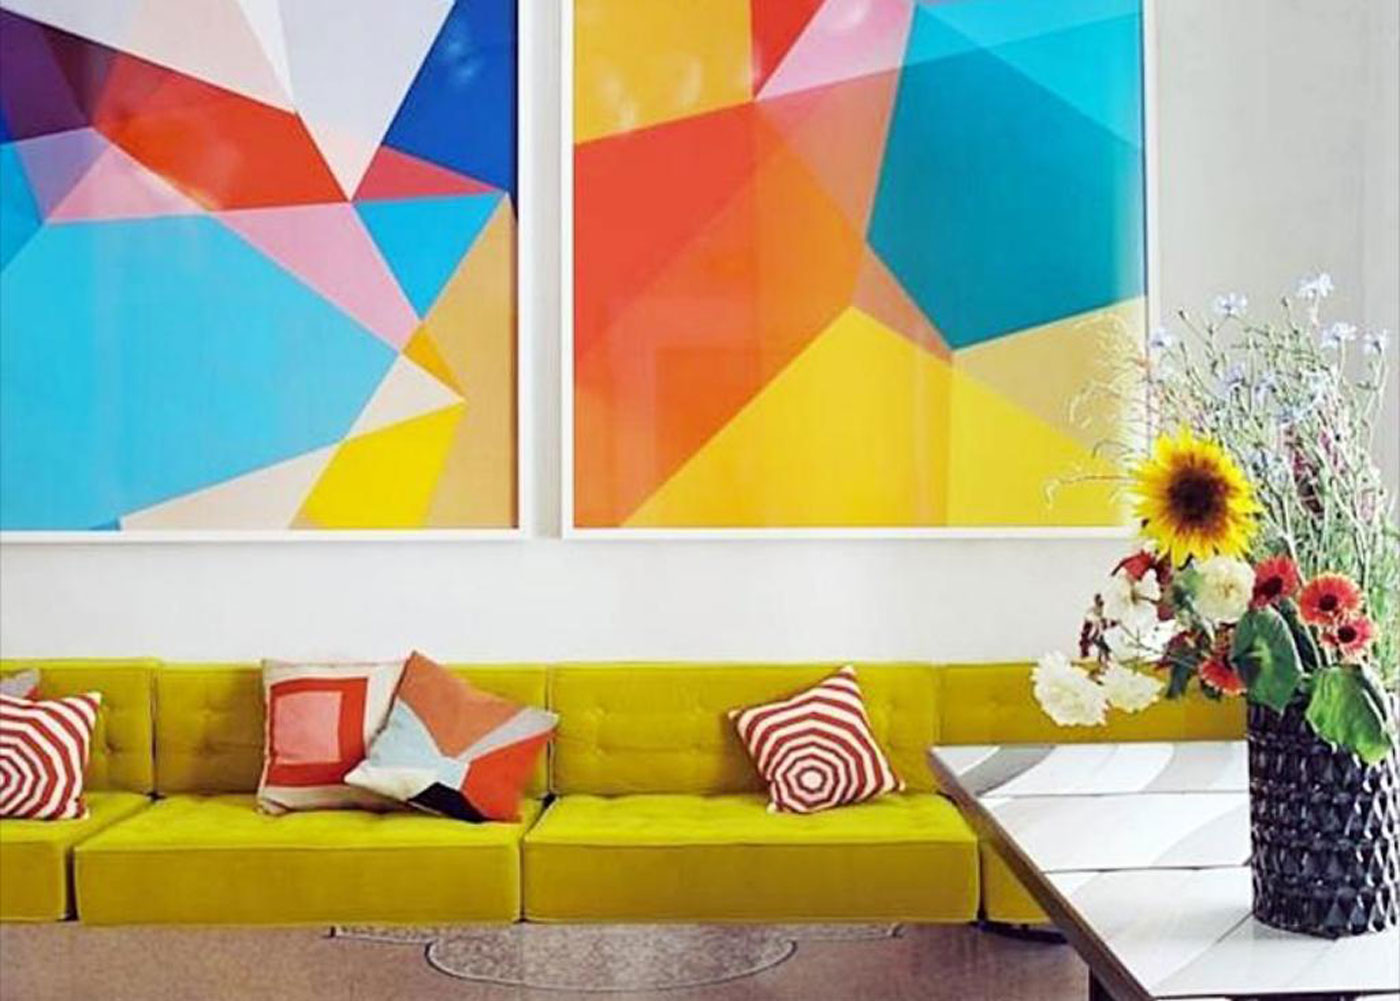 Hotel-Le-Cloitre-Arles-Color-Block